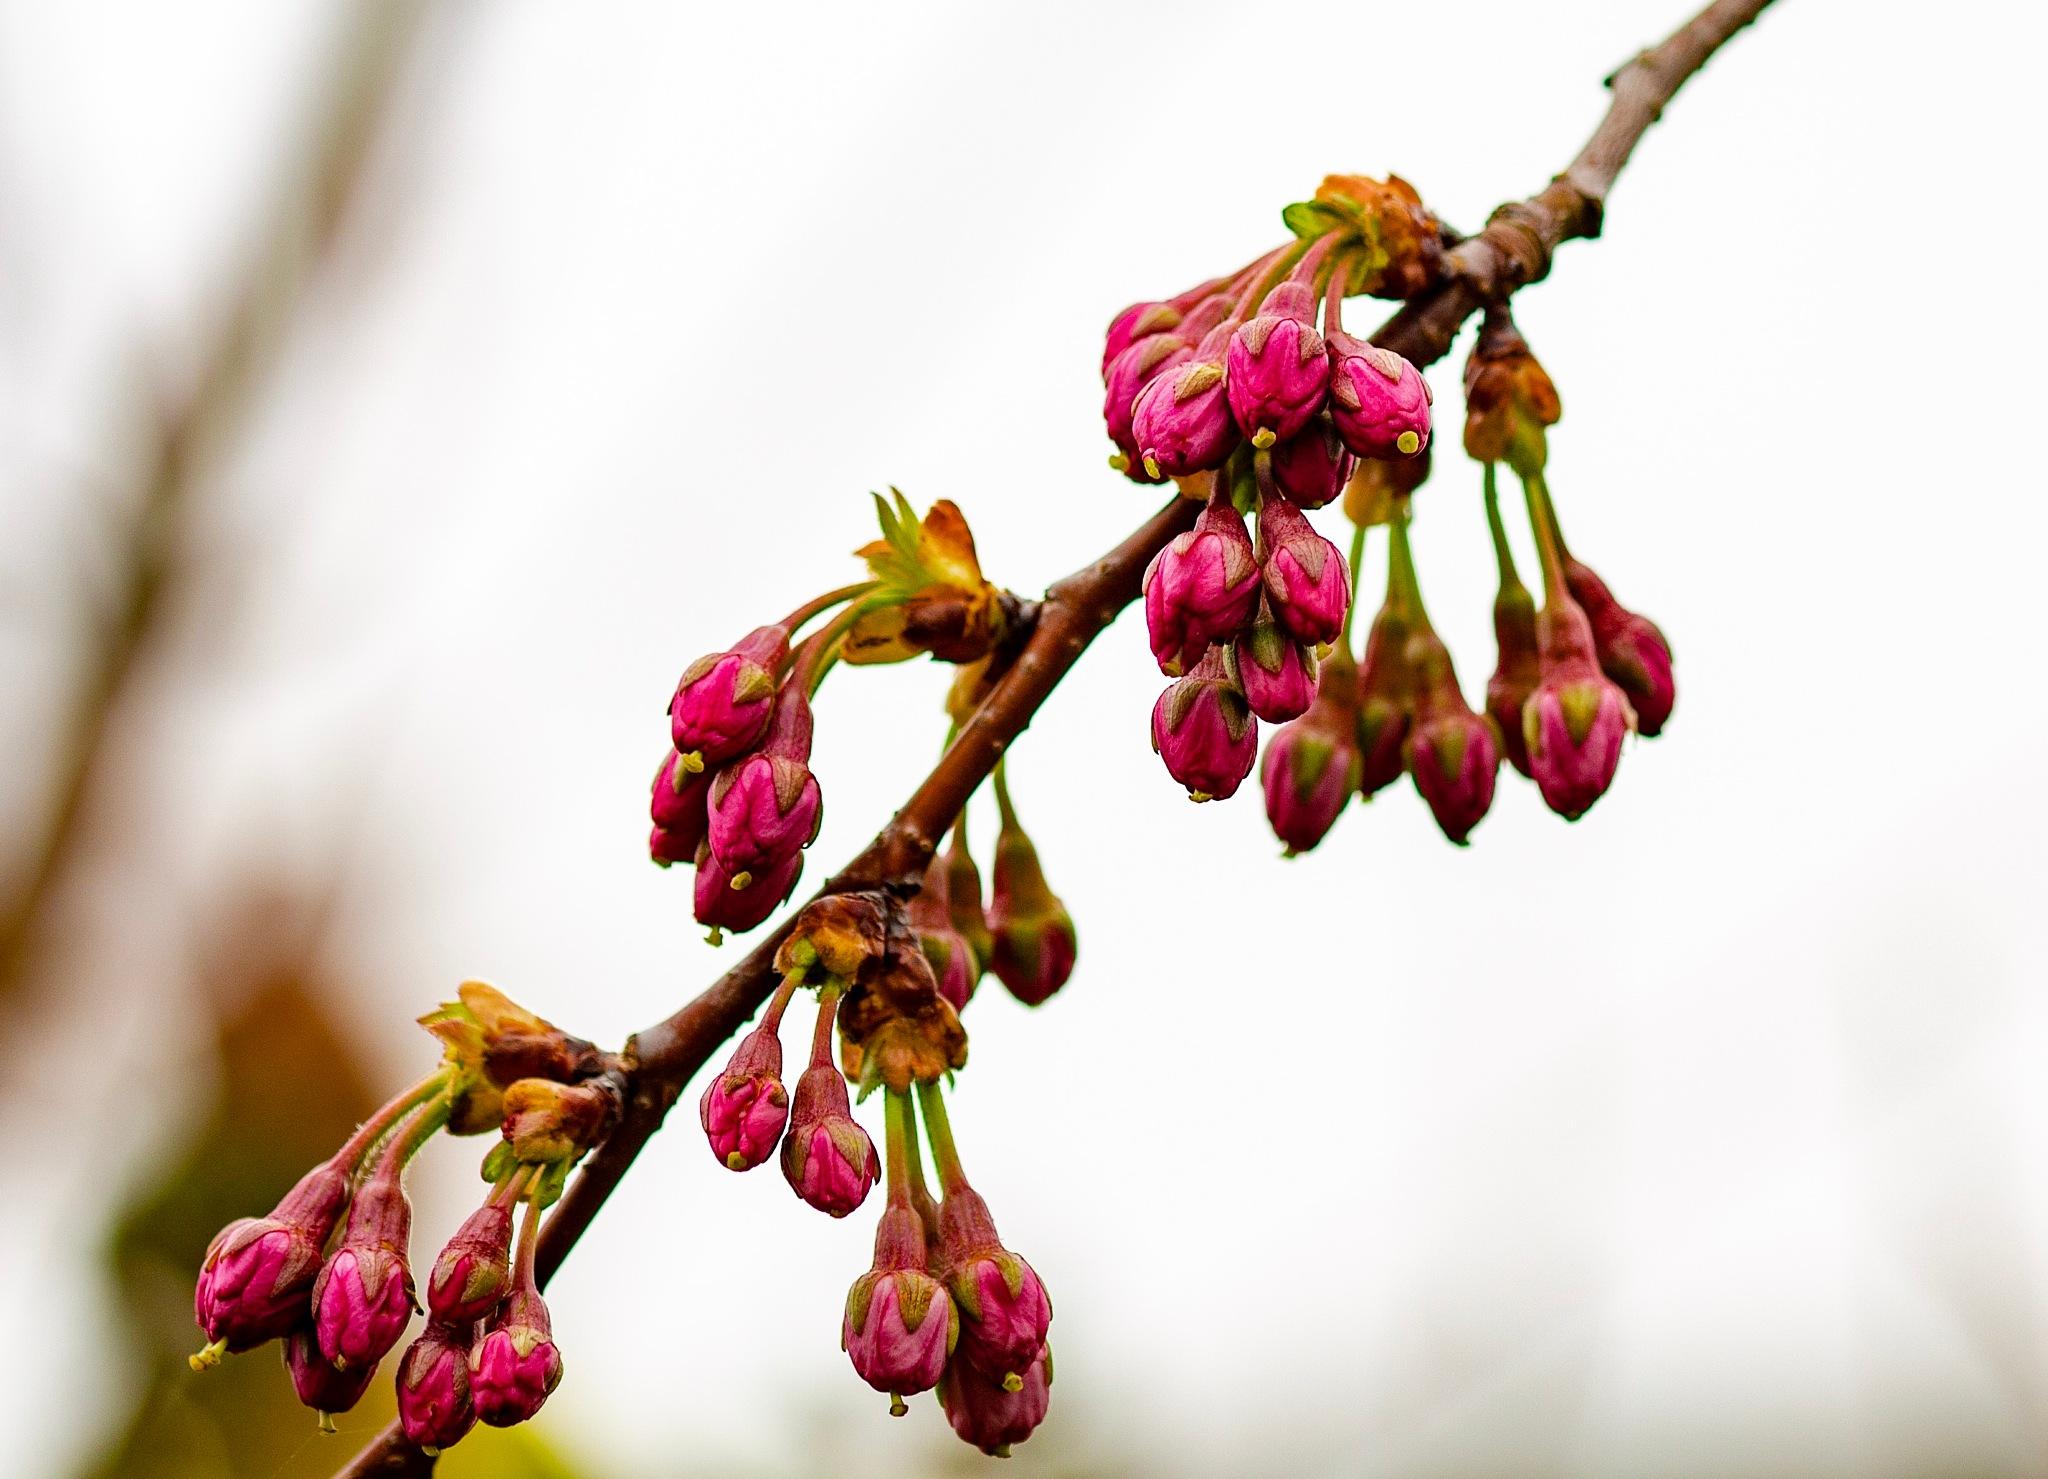 Cherry blossom buds by Richard Slack